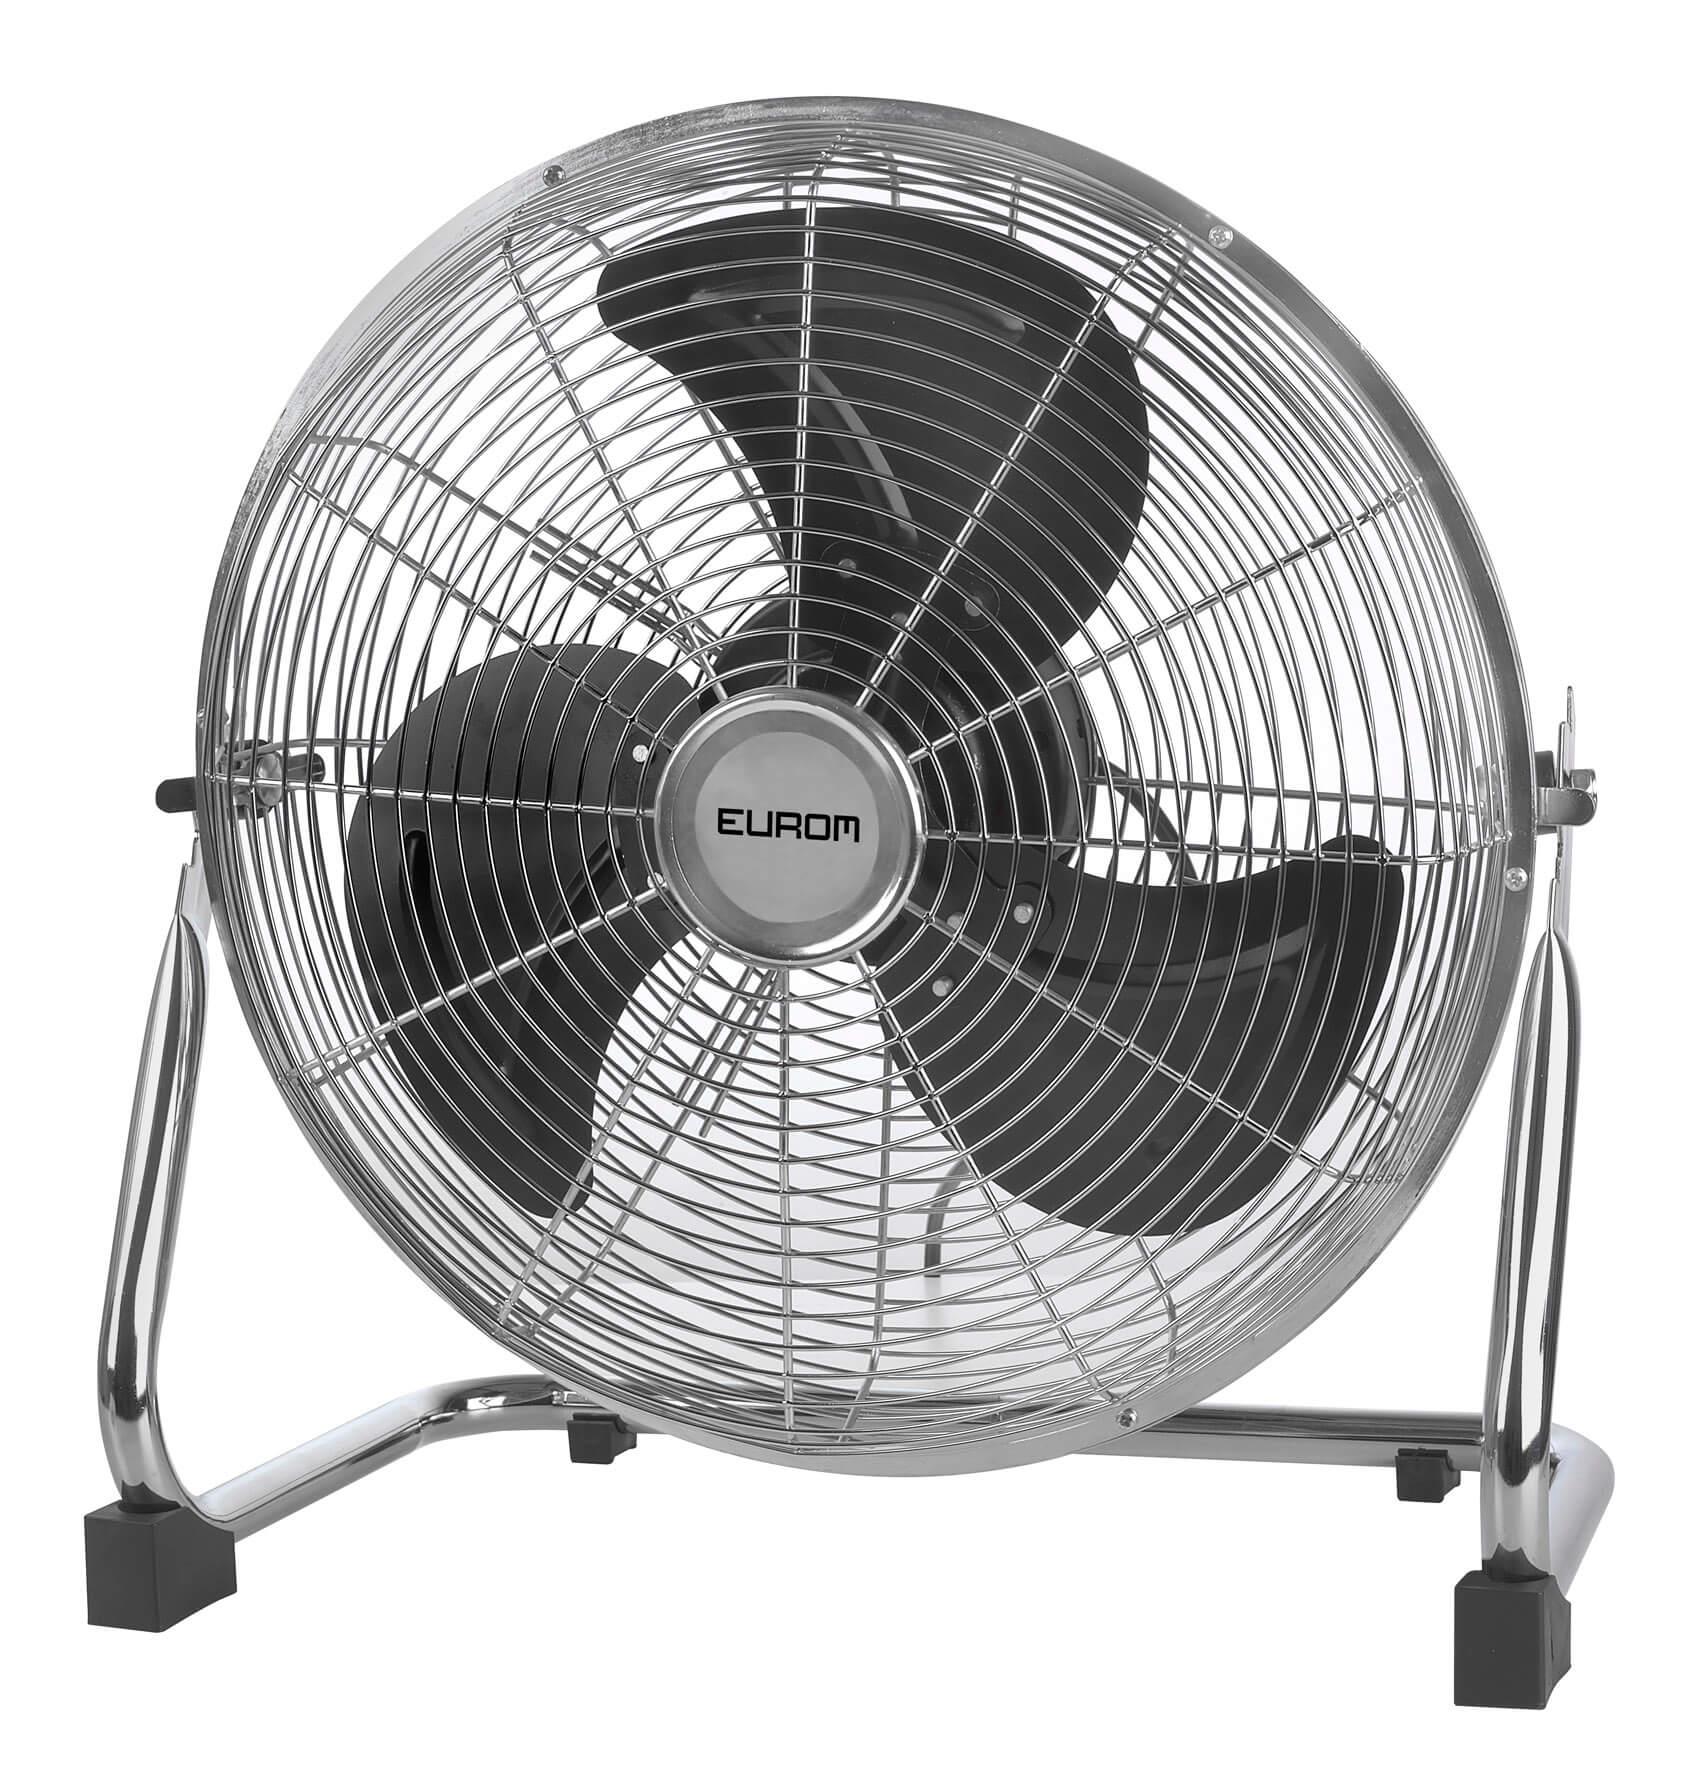 Eurom HVF14-2 Professionele ventilator 35,5 cm   Vloermodel